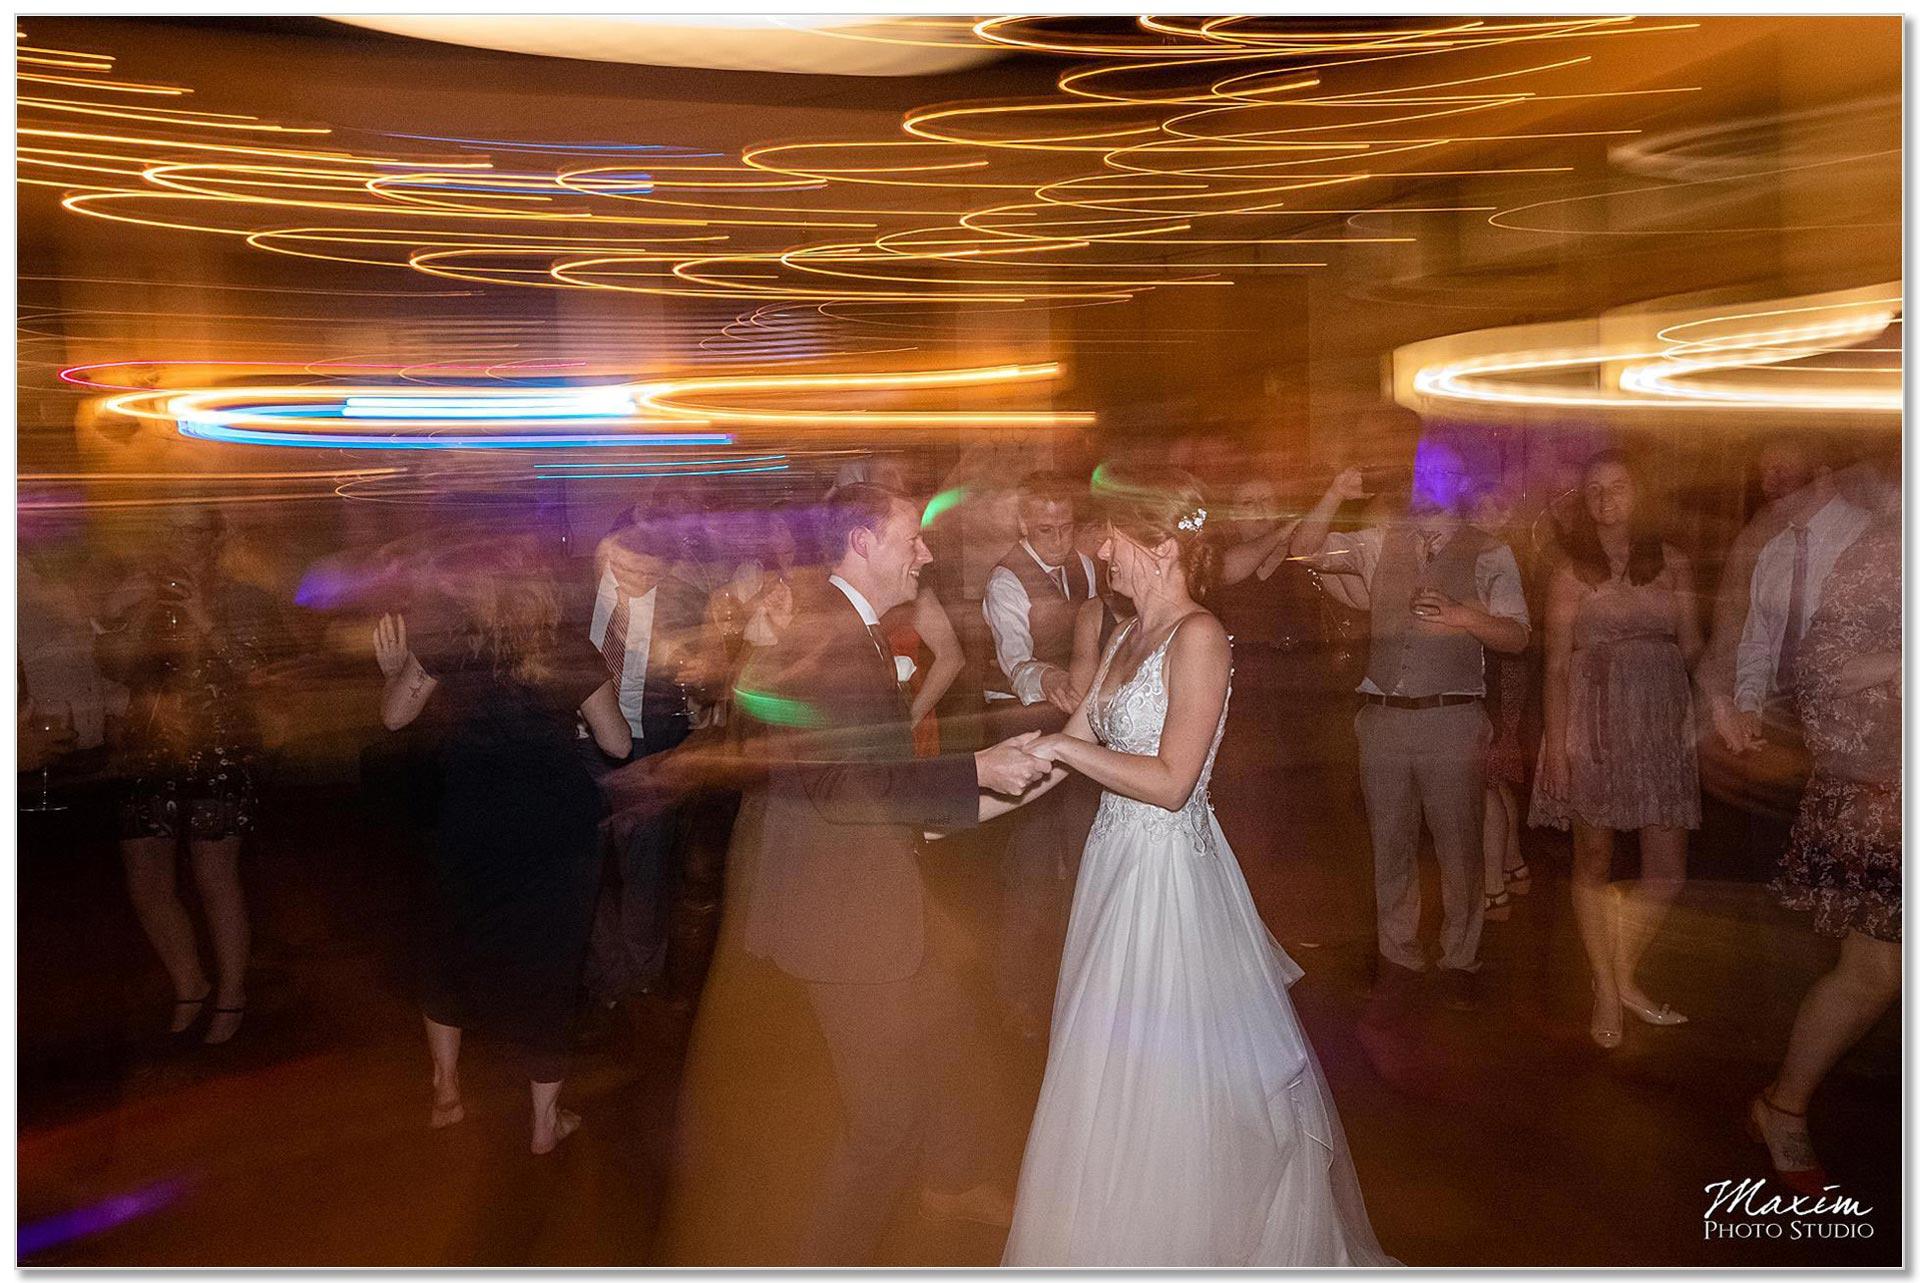 Backstage Event Center Wedding Reception Bride groom dancing